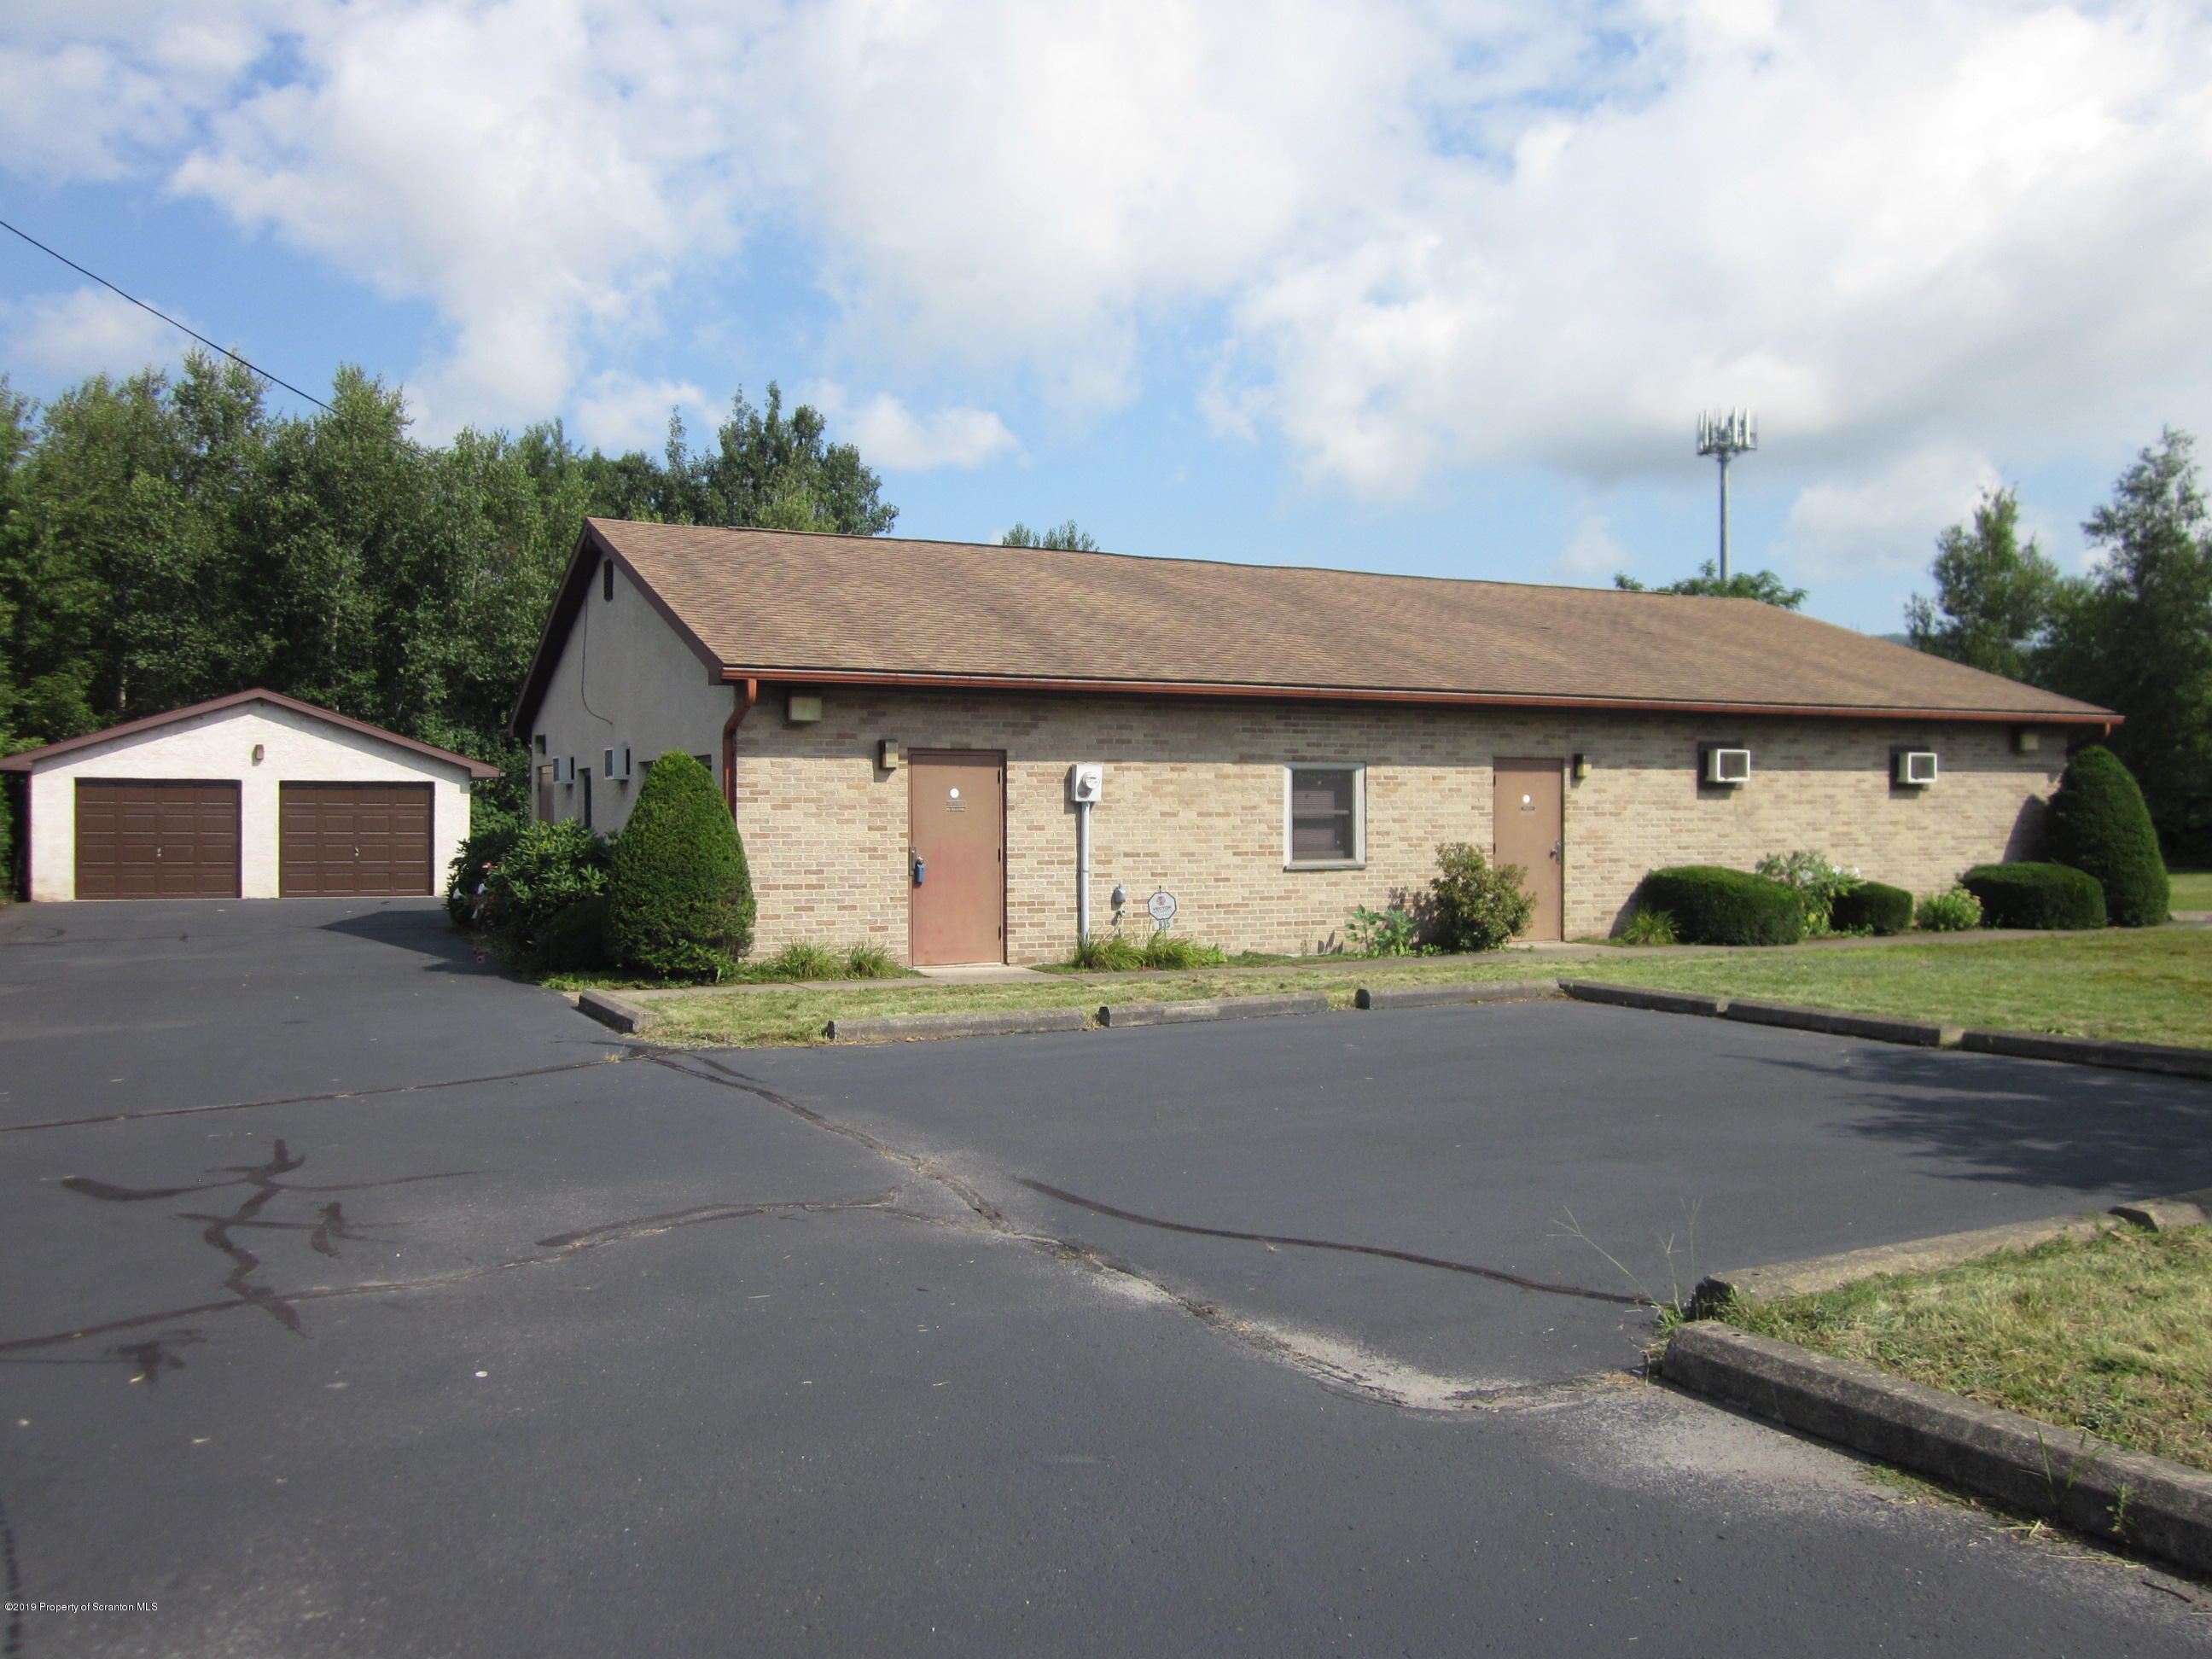 835 Enterprise St, Dickson City, Pennsylvania 18519, ,4 BathroomsBathrooms,Commercial,For Sale,Enterprise,19-3843